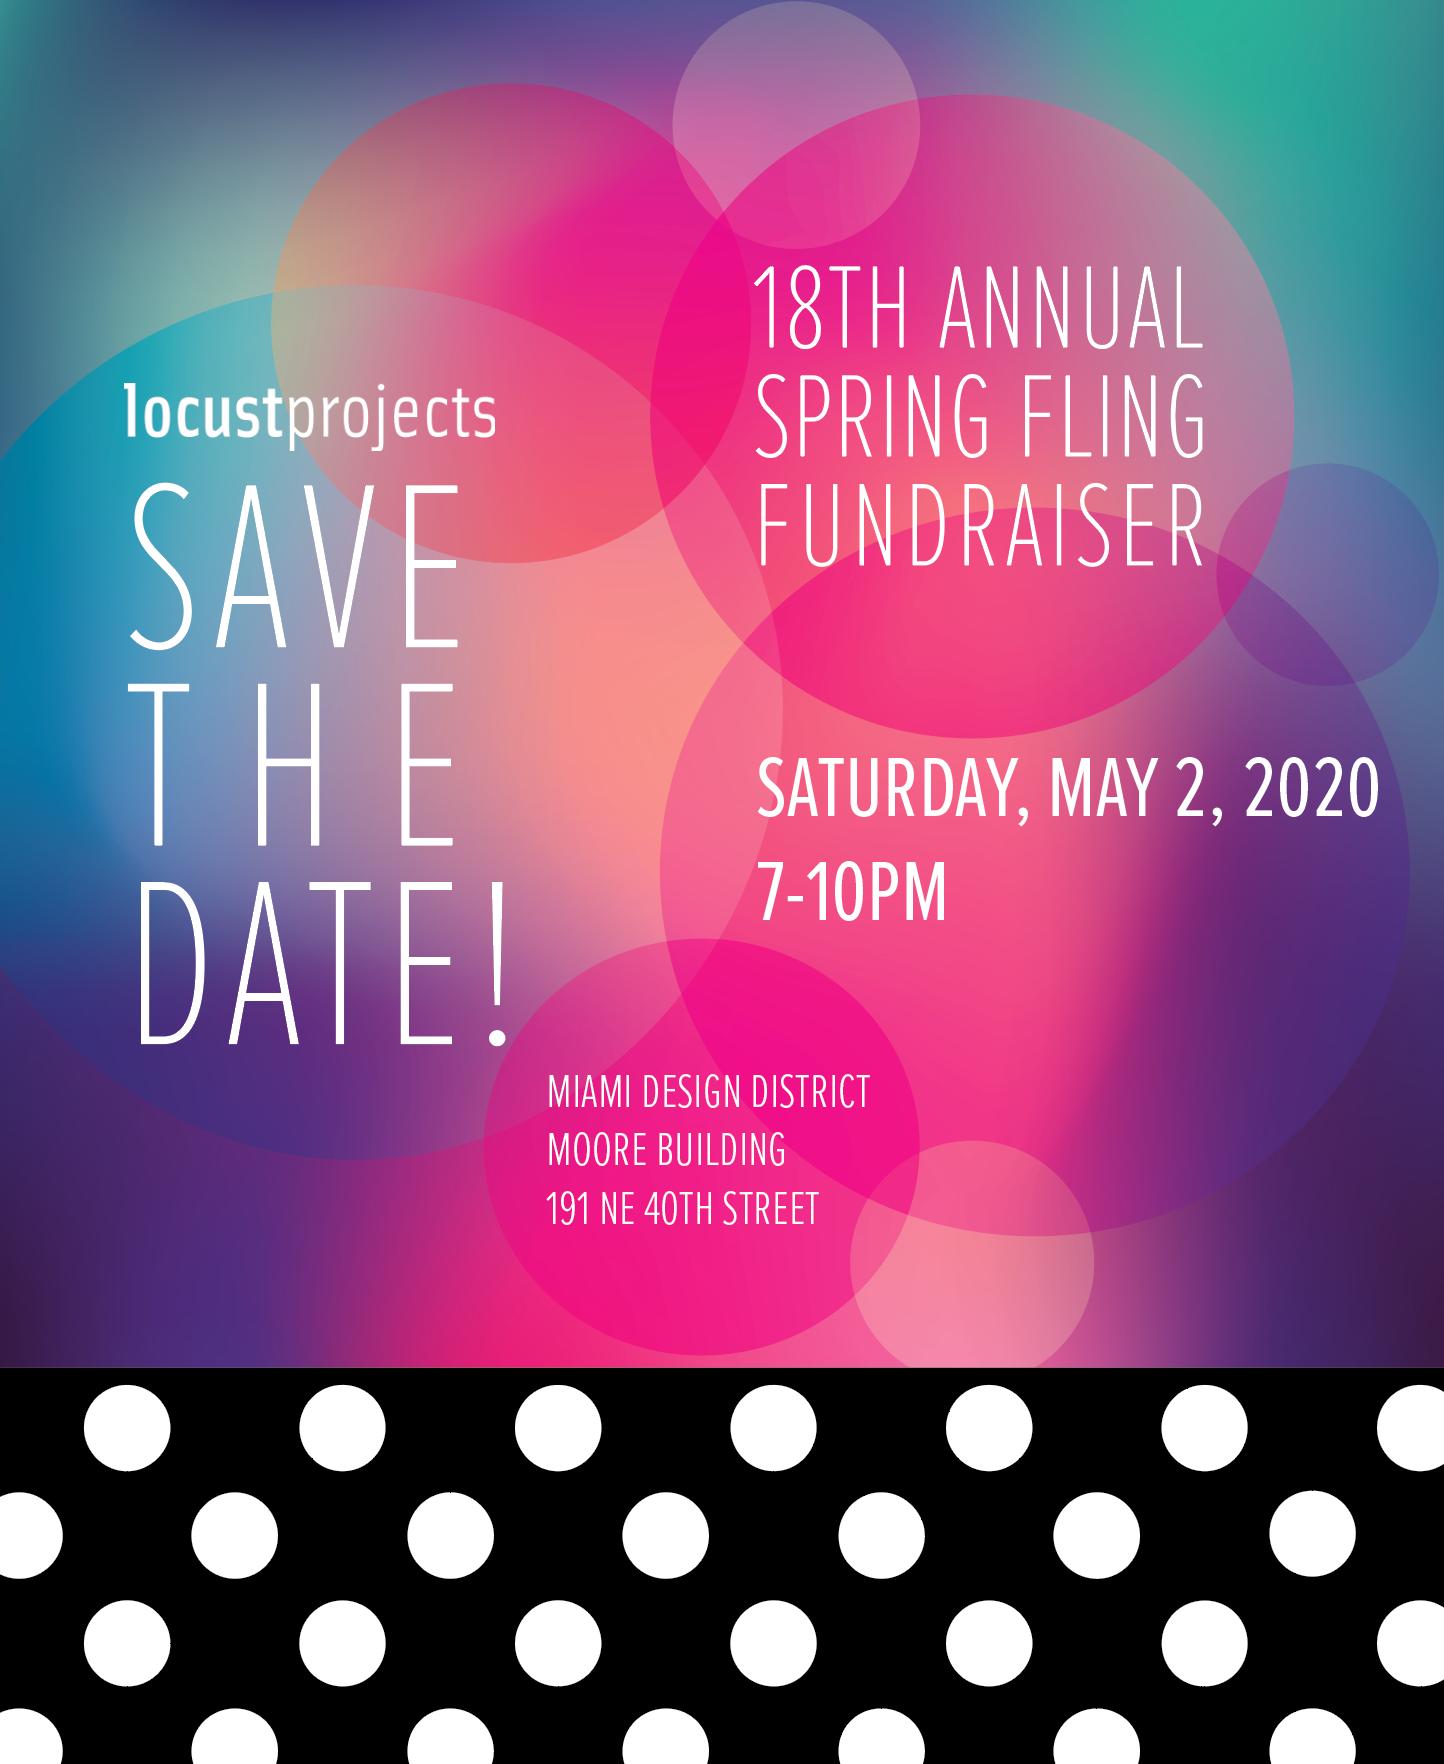 18th Annual Spring Fling Fundraiser